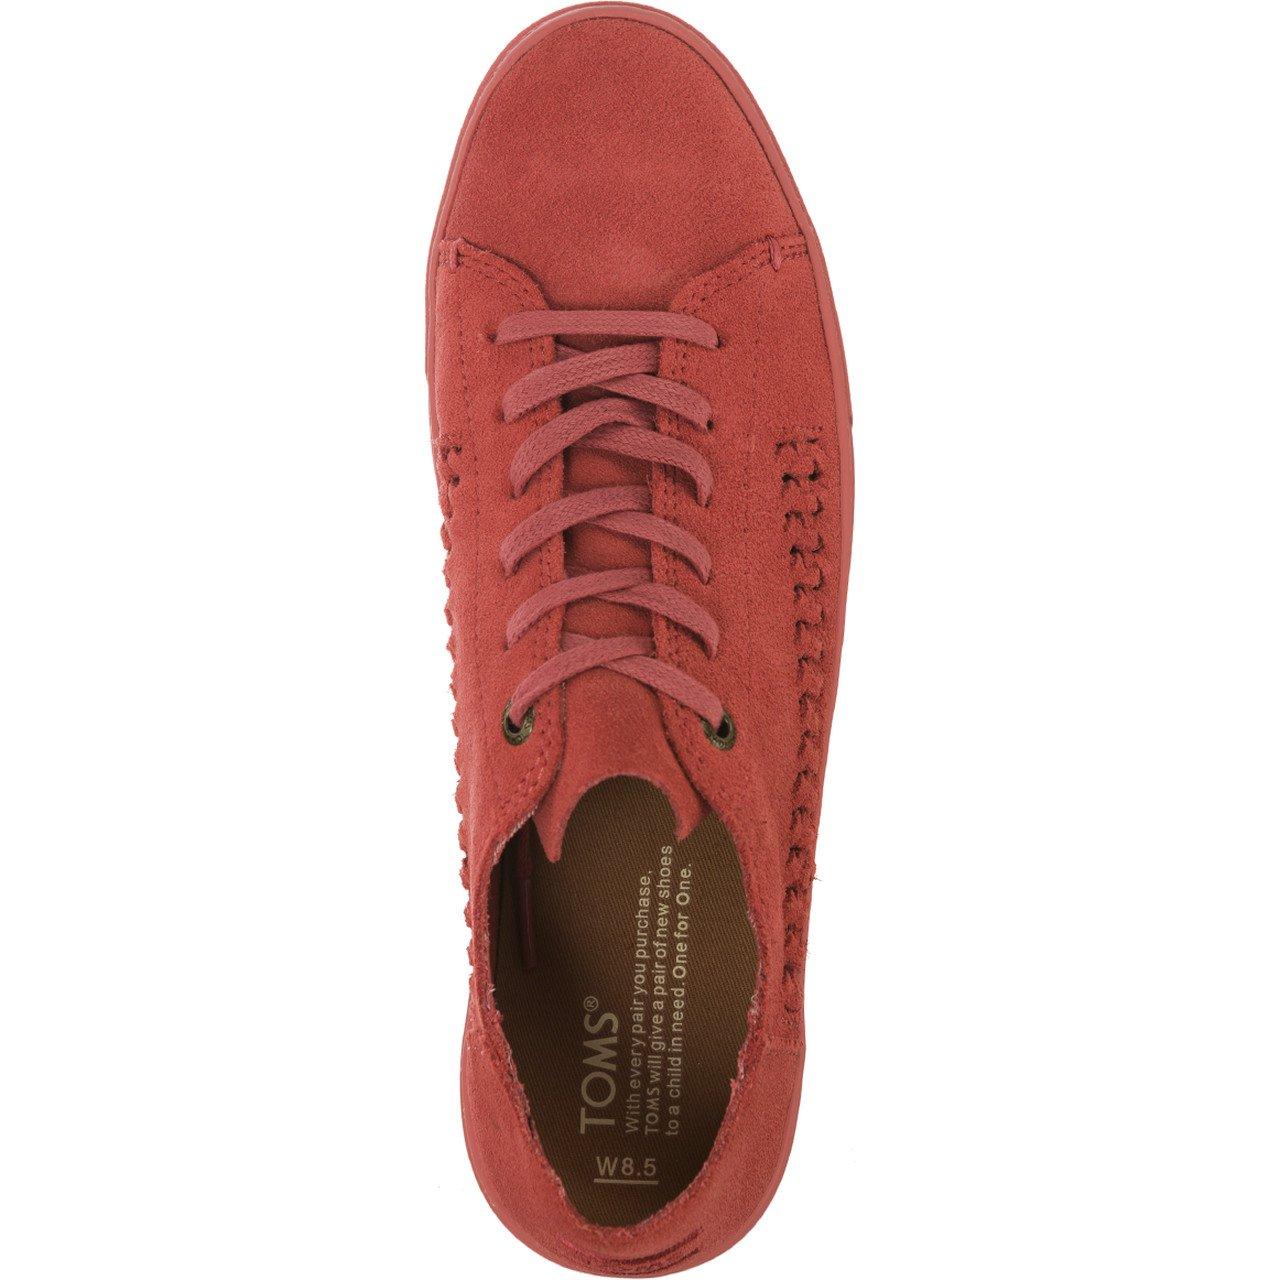 Trampki | Nike Sportswear Air Max 95 Damskie Mallow | Na